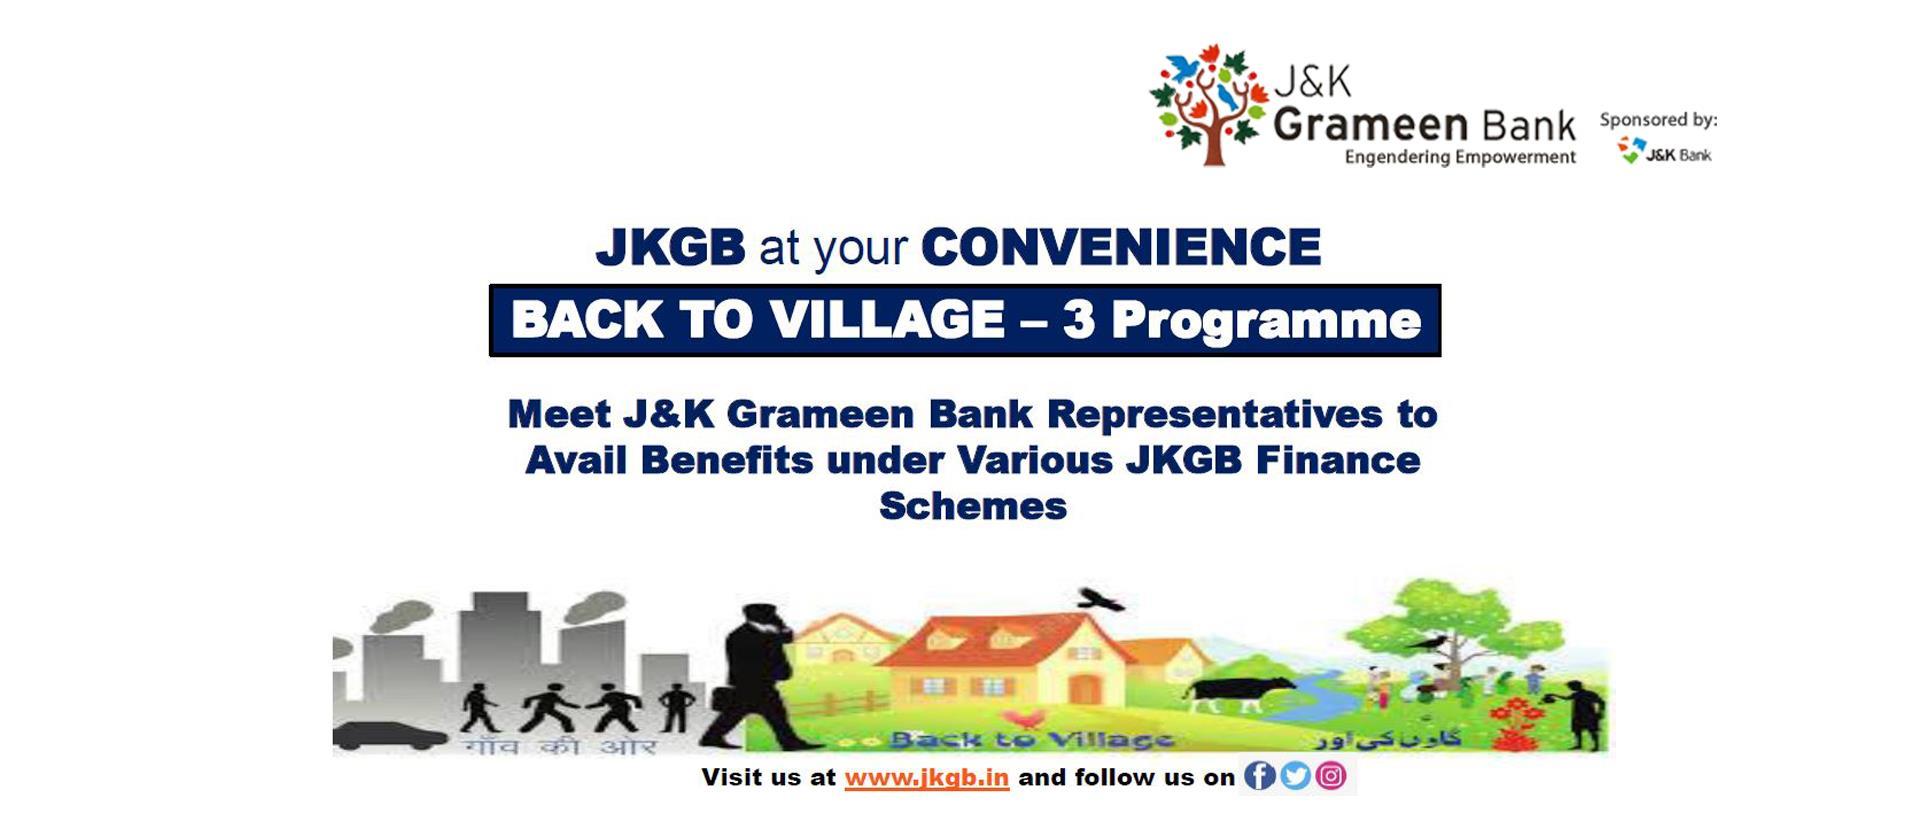 J&K Grameen Bank - Engendering Empowerment: Official Website